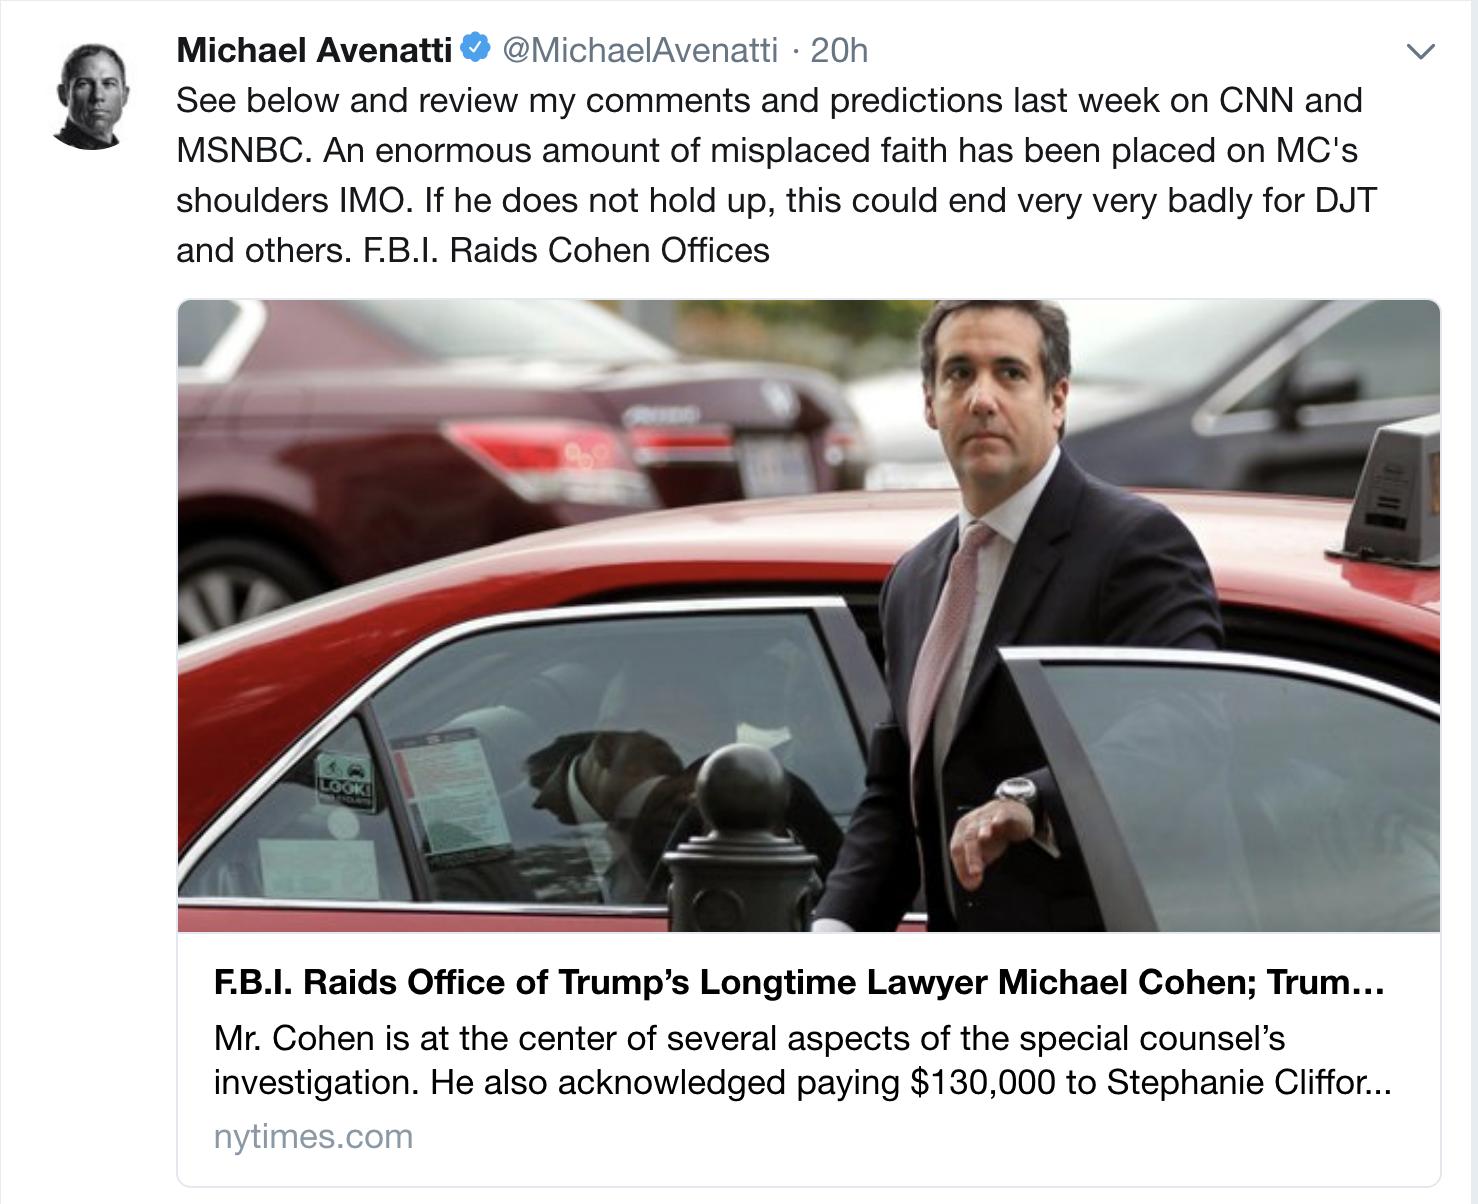 Screen-Shot-2018-04-10-at-10.58.58-AM Stormy Daniels' Attorney Responds To Trump's Arbitration Request Like A Badass Corruption Crime Donald Trump Politics Top Stories